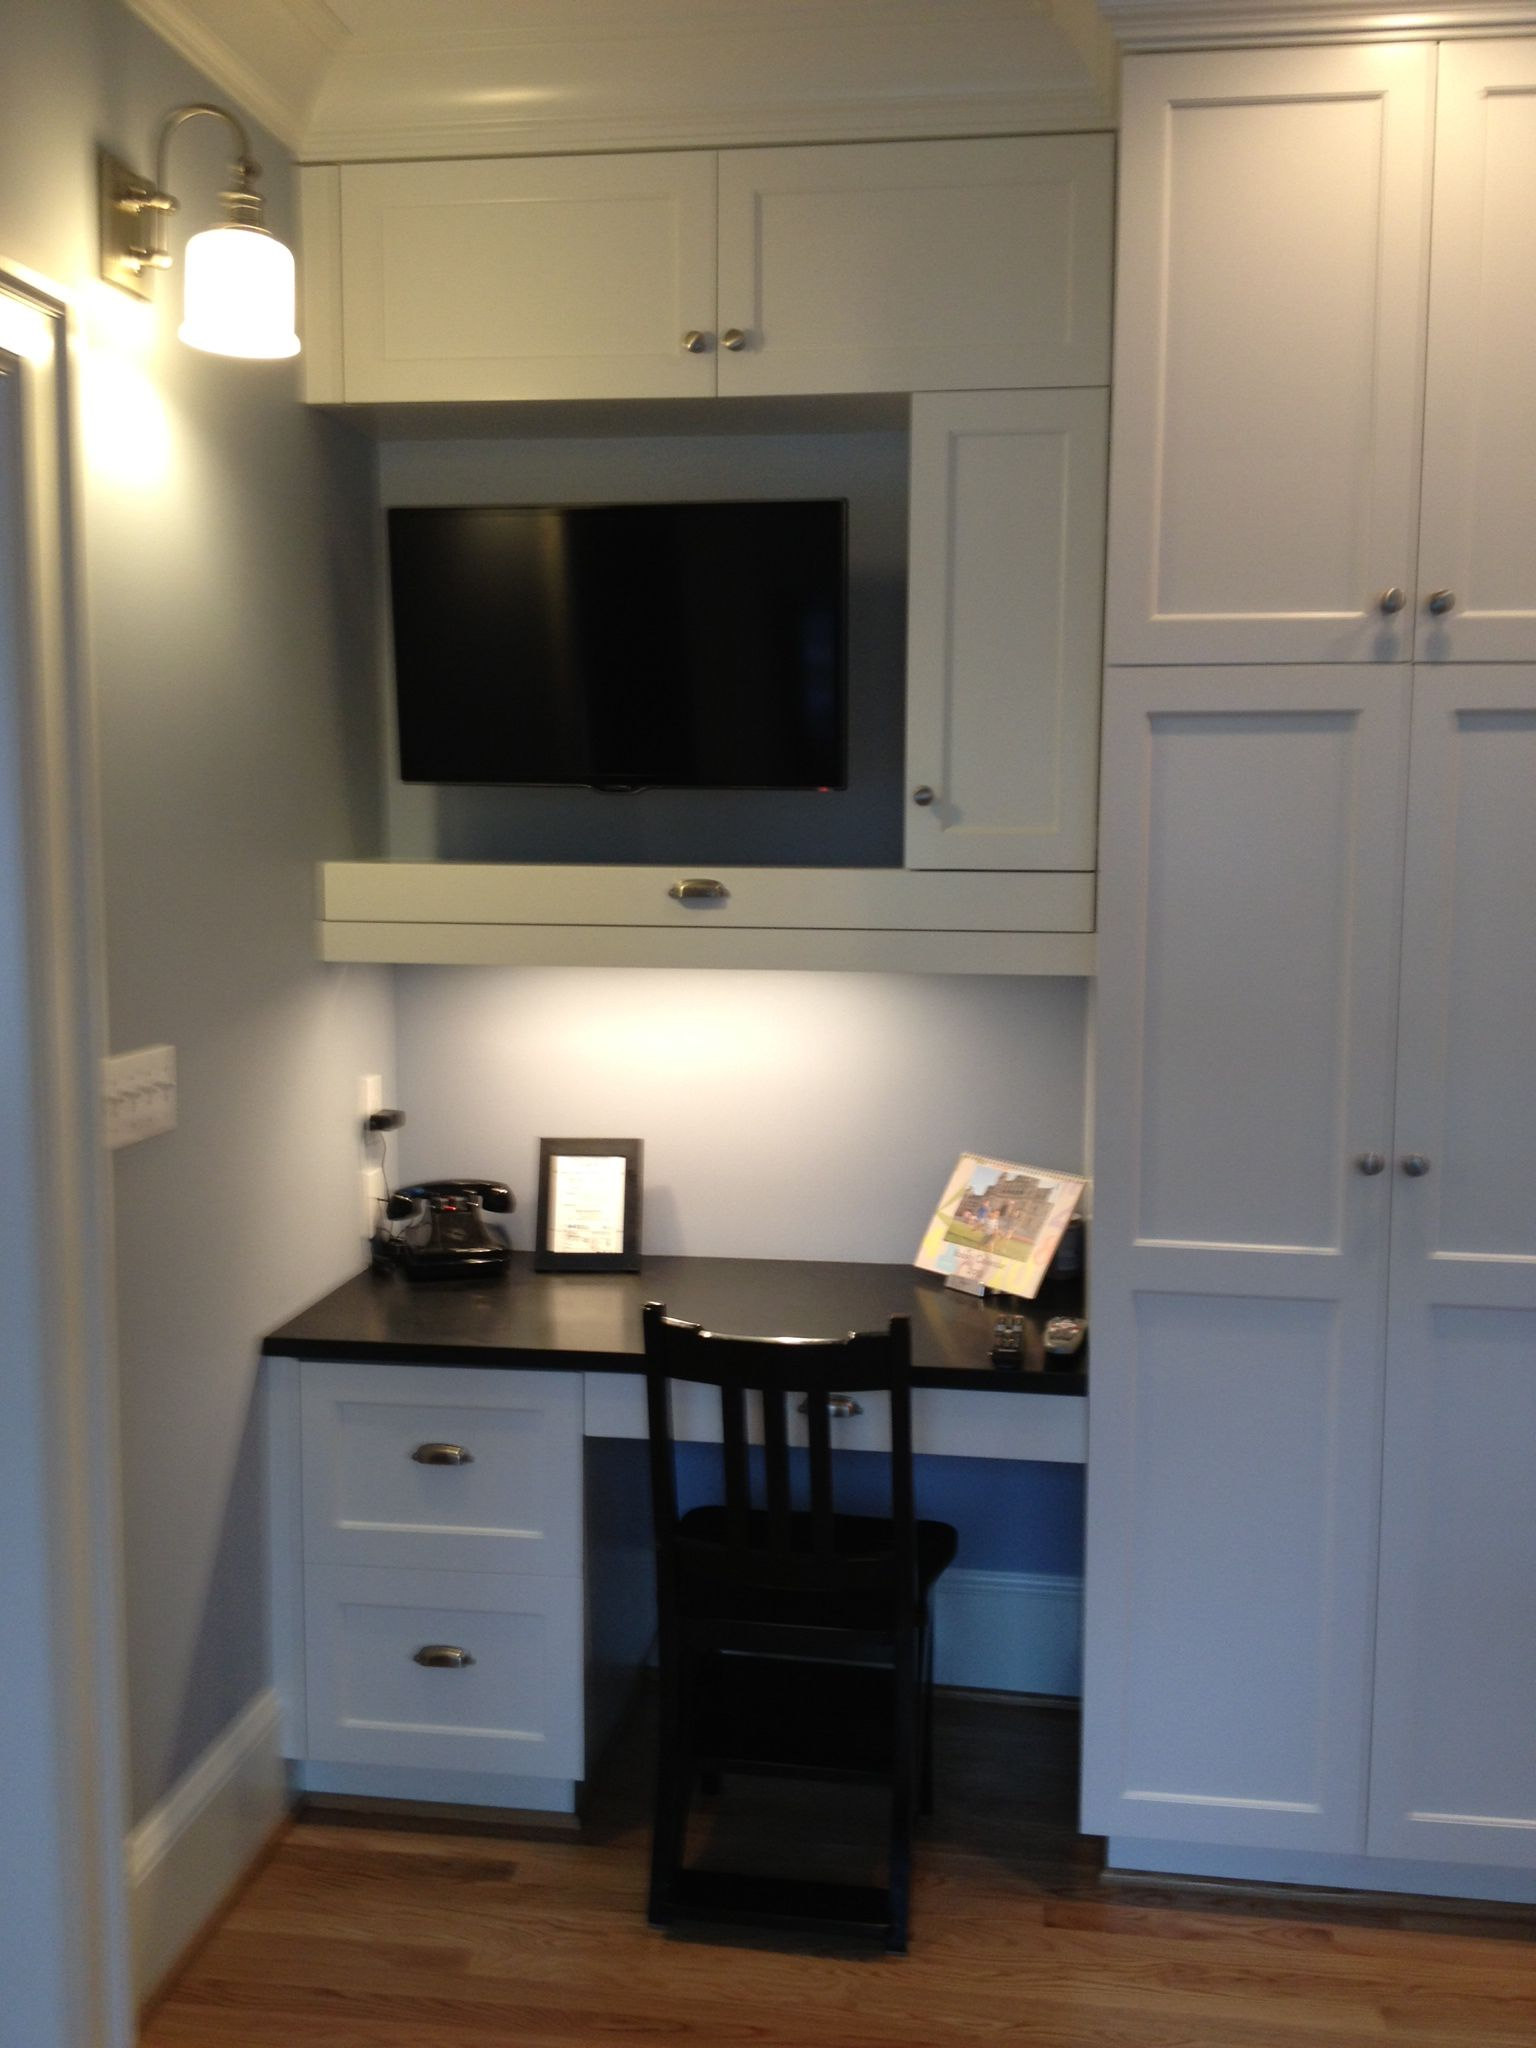 49s Portland kitchen View of kitchen desk from corner banquette